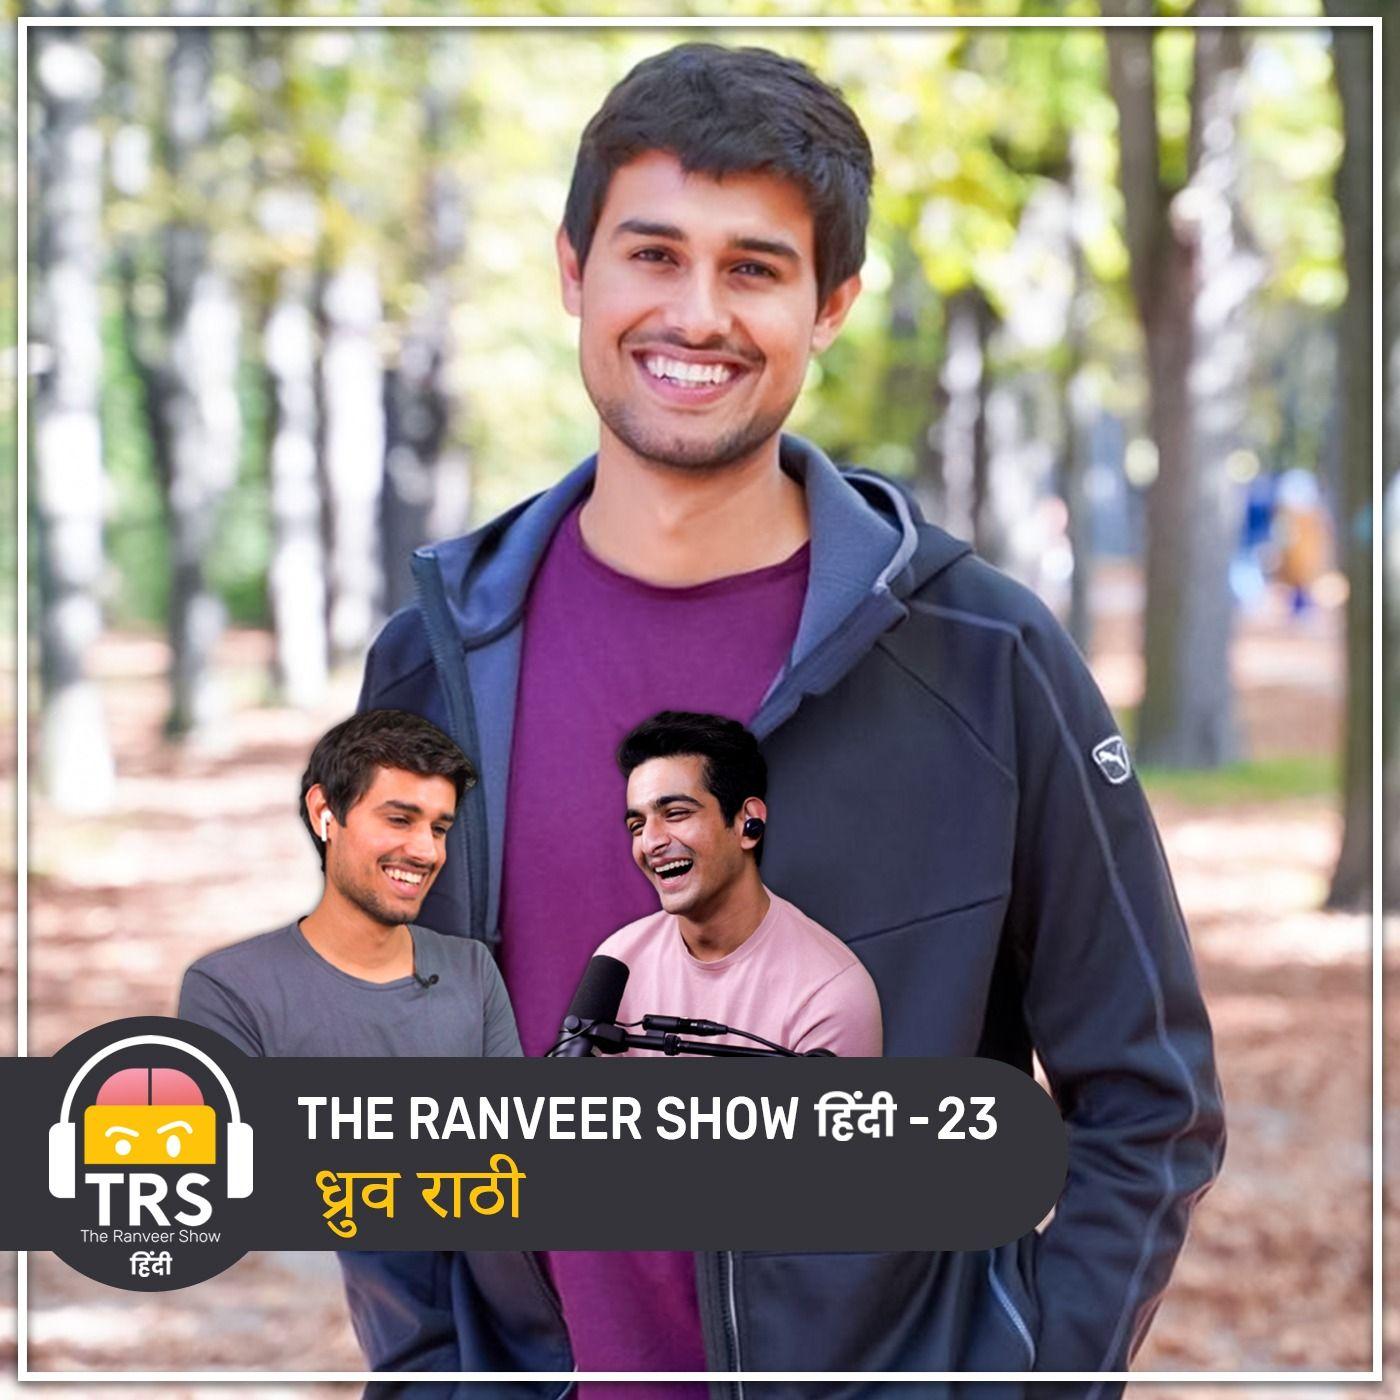 Dhruv Rathee Exposed Like Never Before | The Ranveer Show हिंदी 23